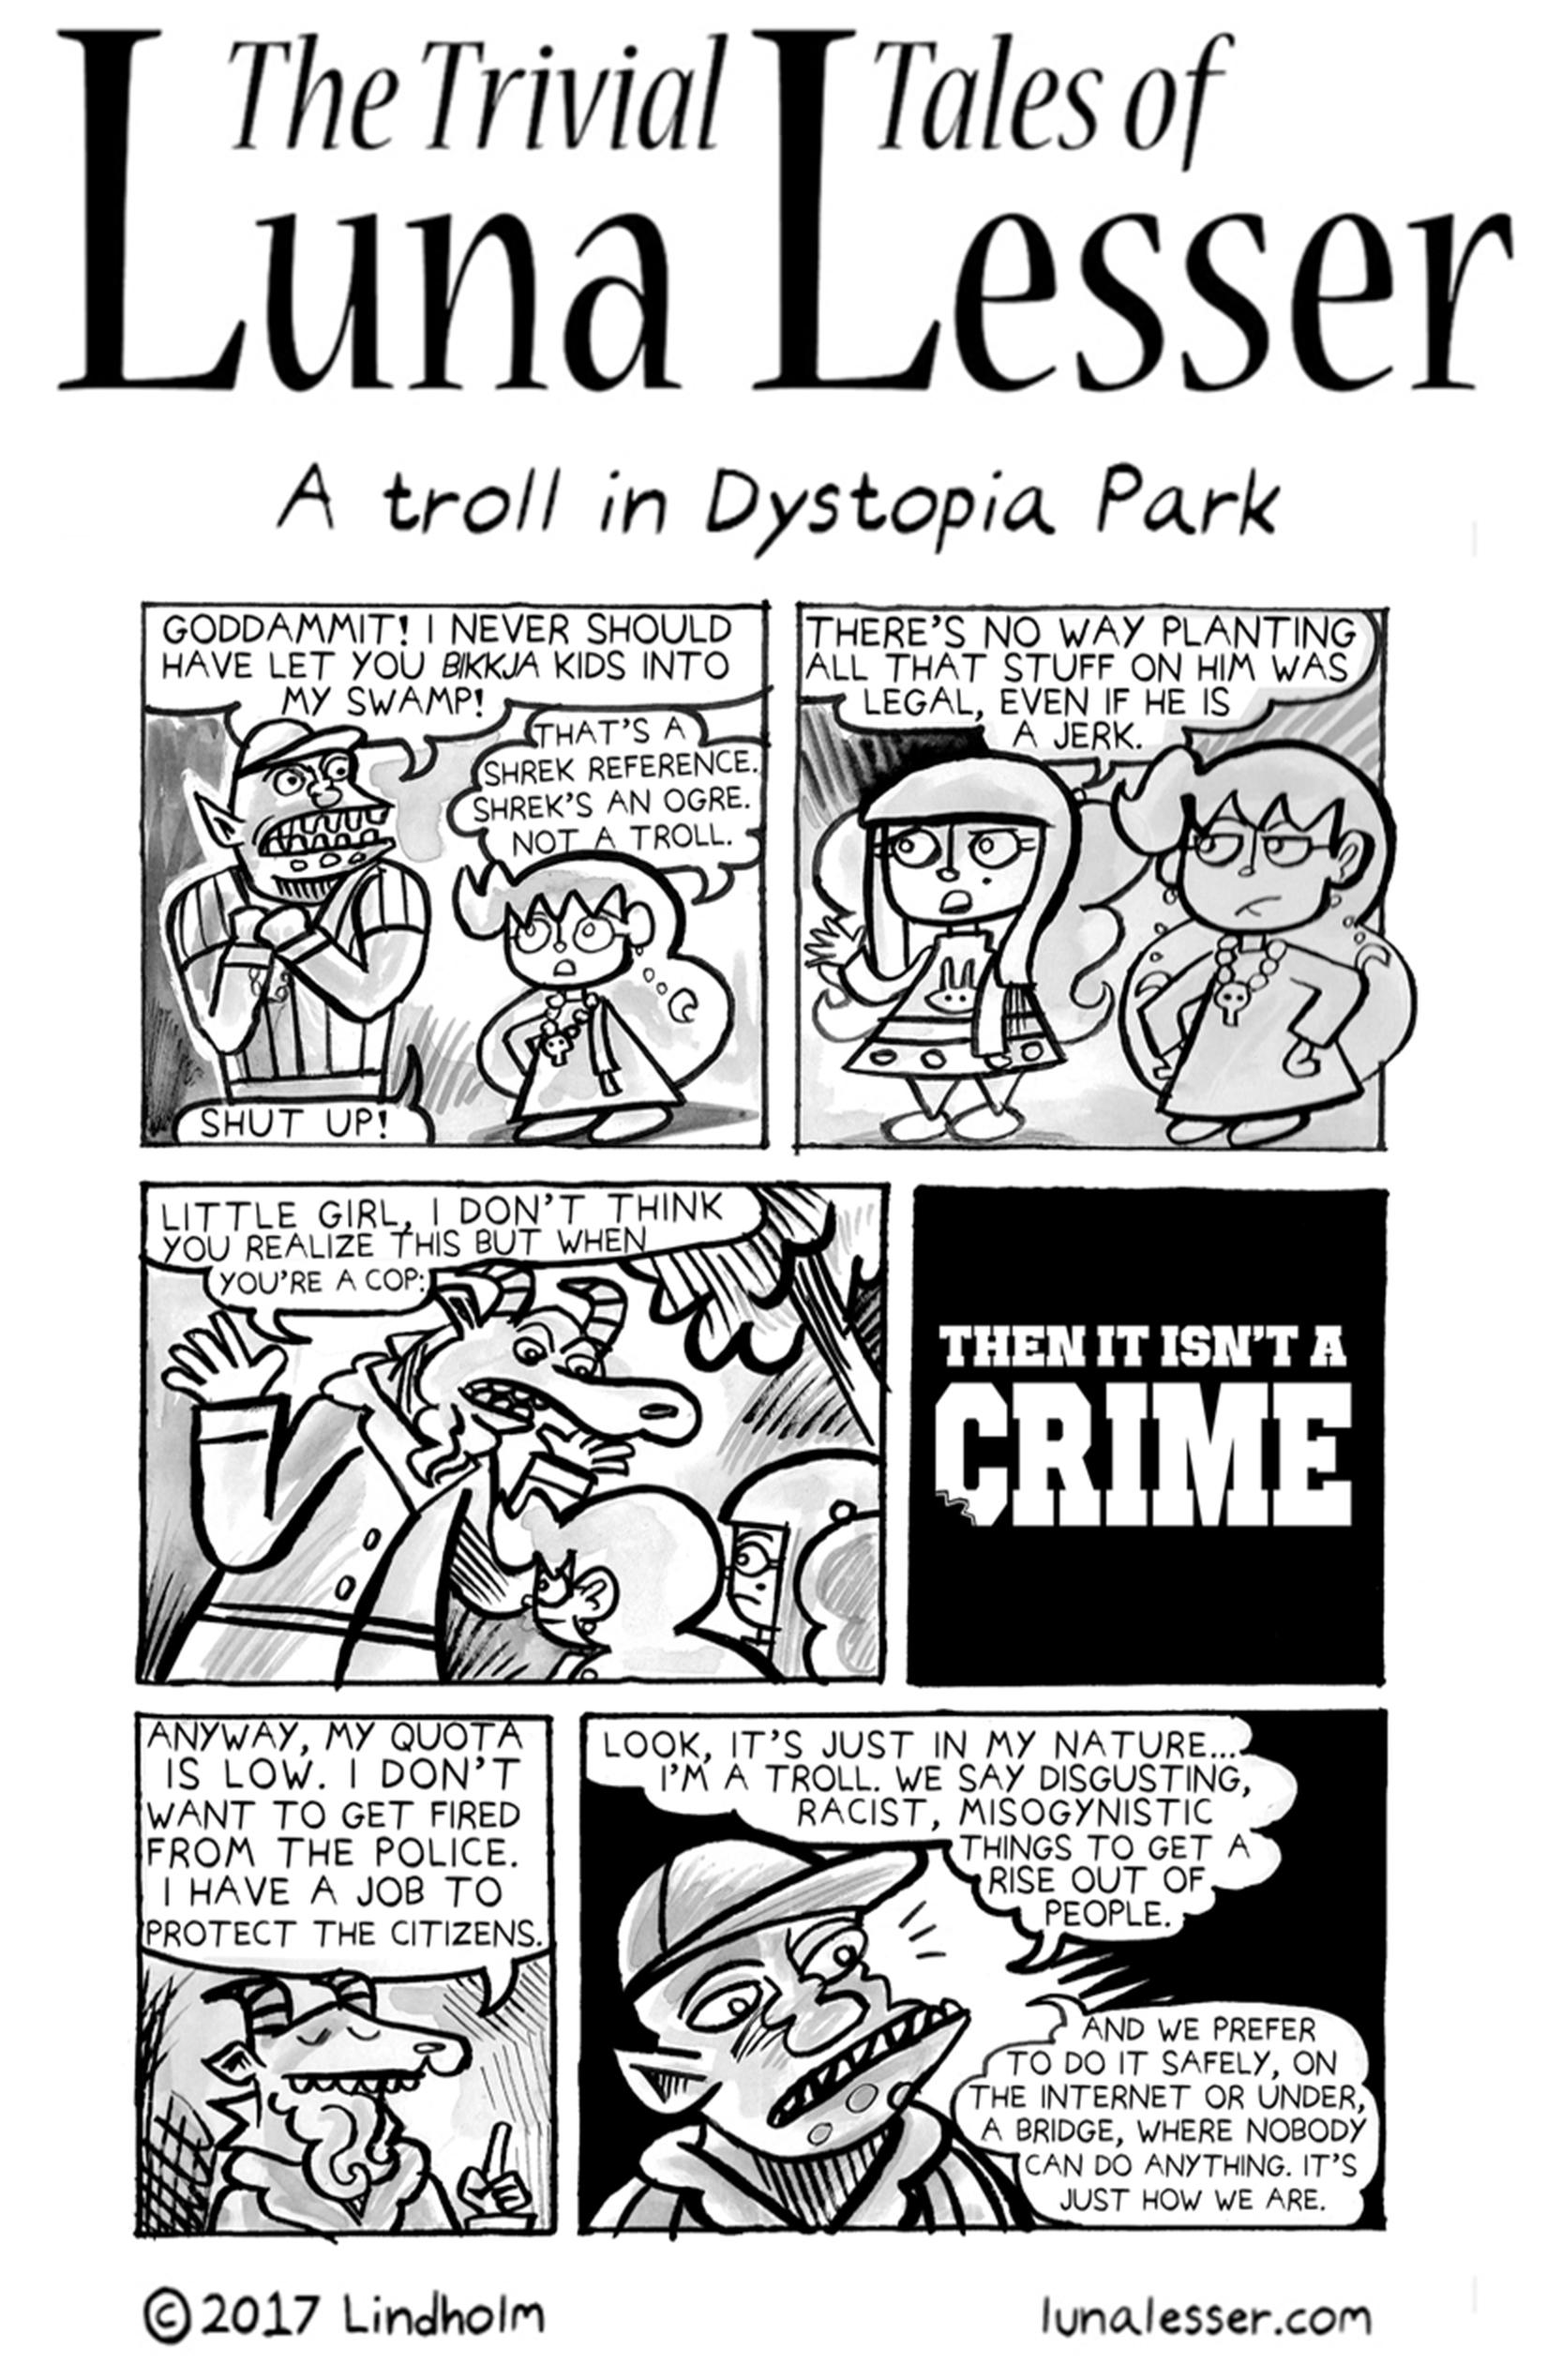 A troll in Dystopia Park (6/8)